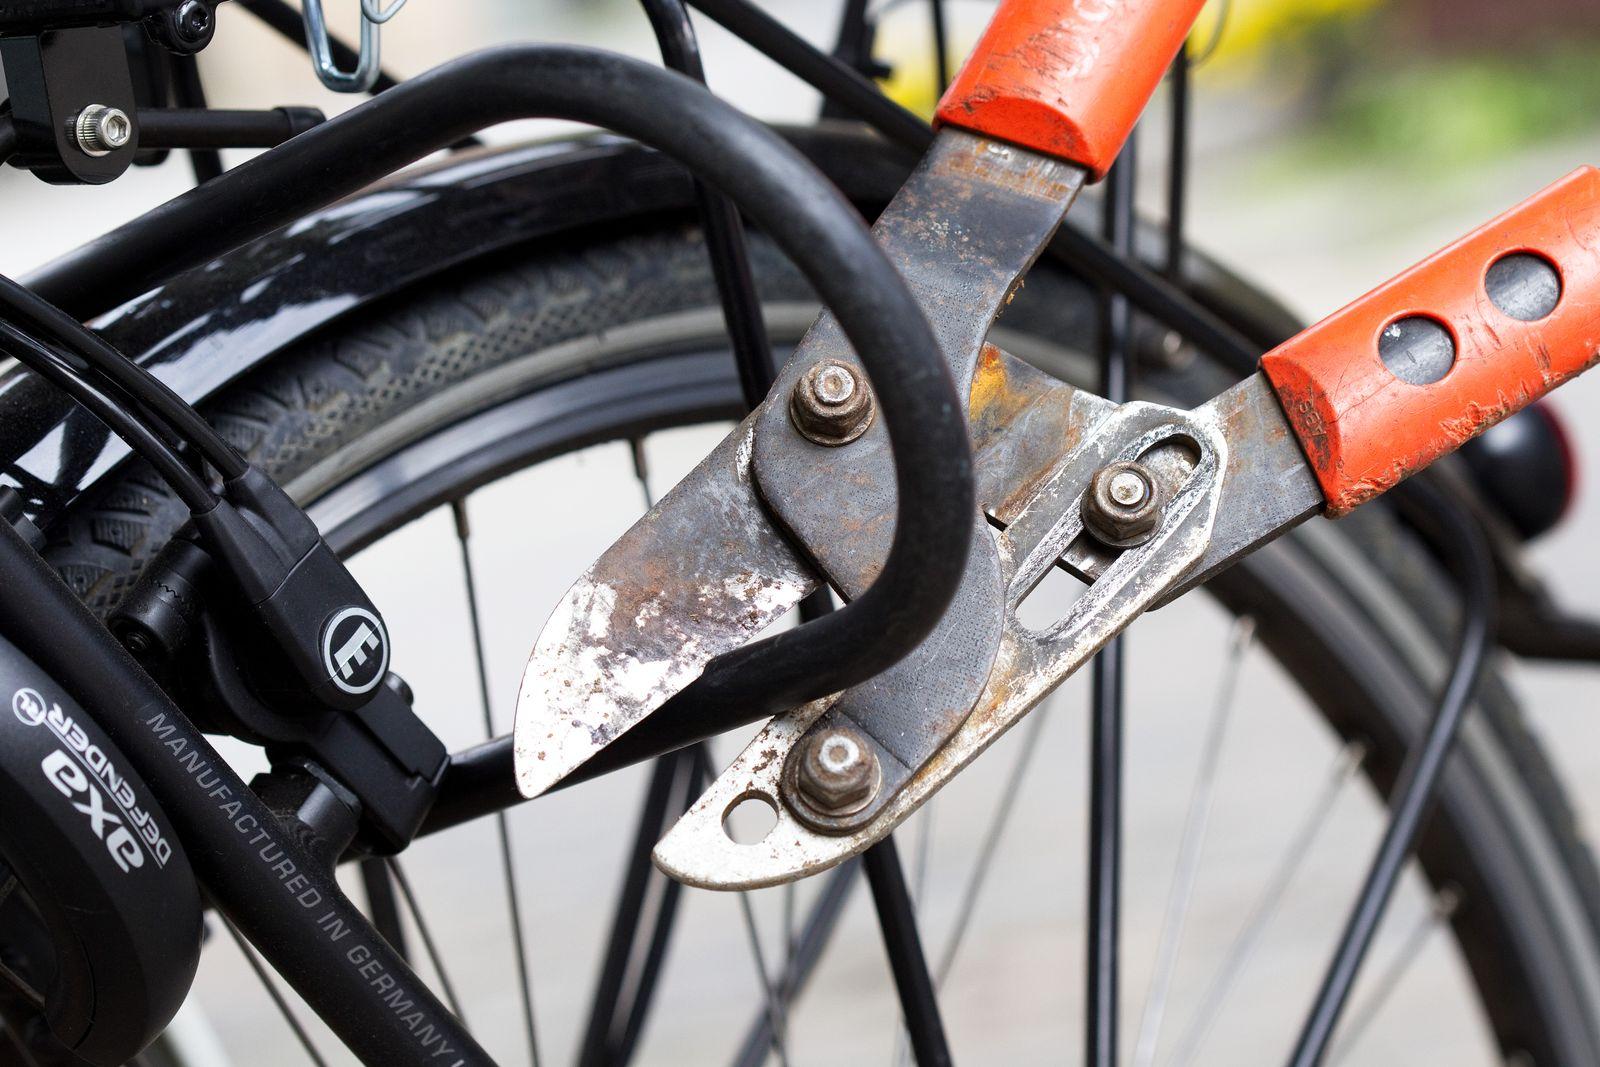 Fahrraddiebstähle